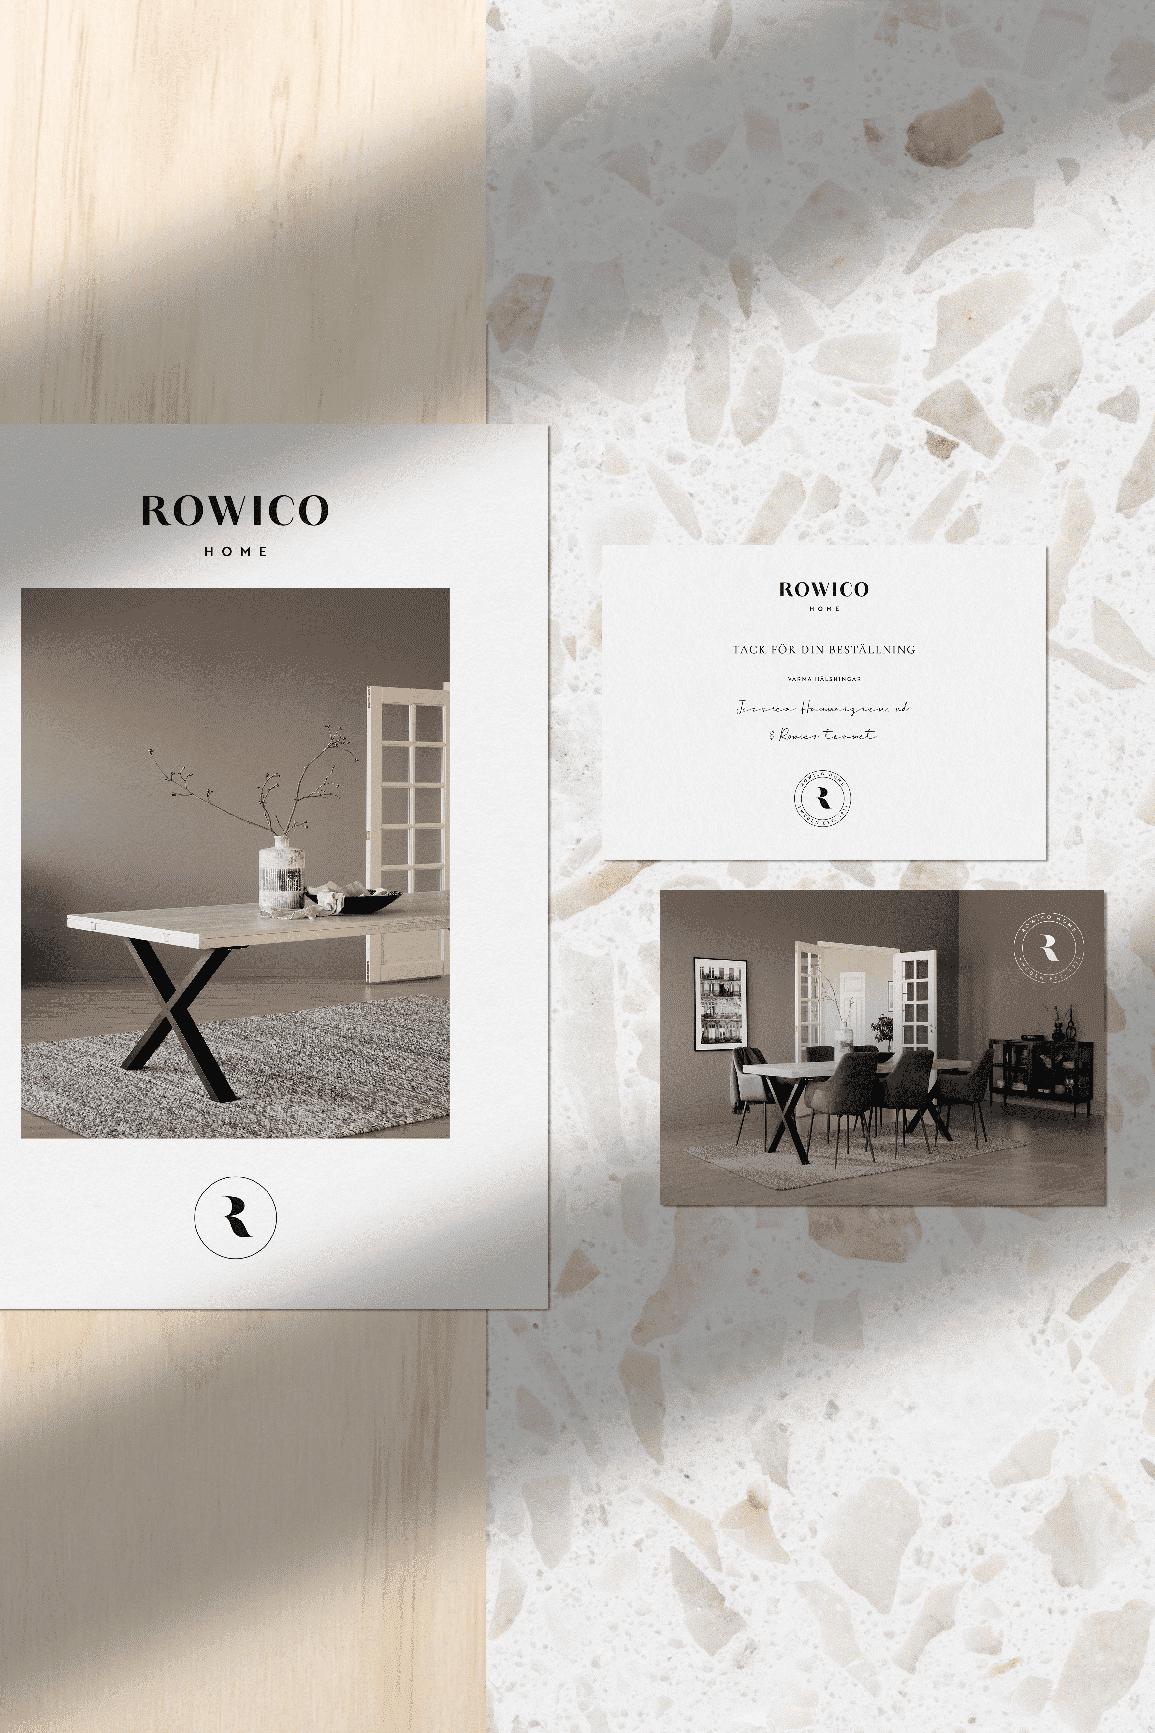 Rowico_finalscene_big_2x3